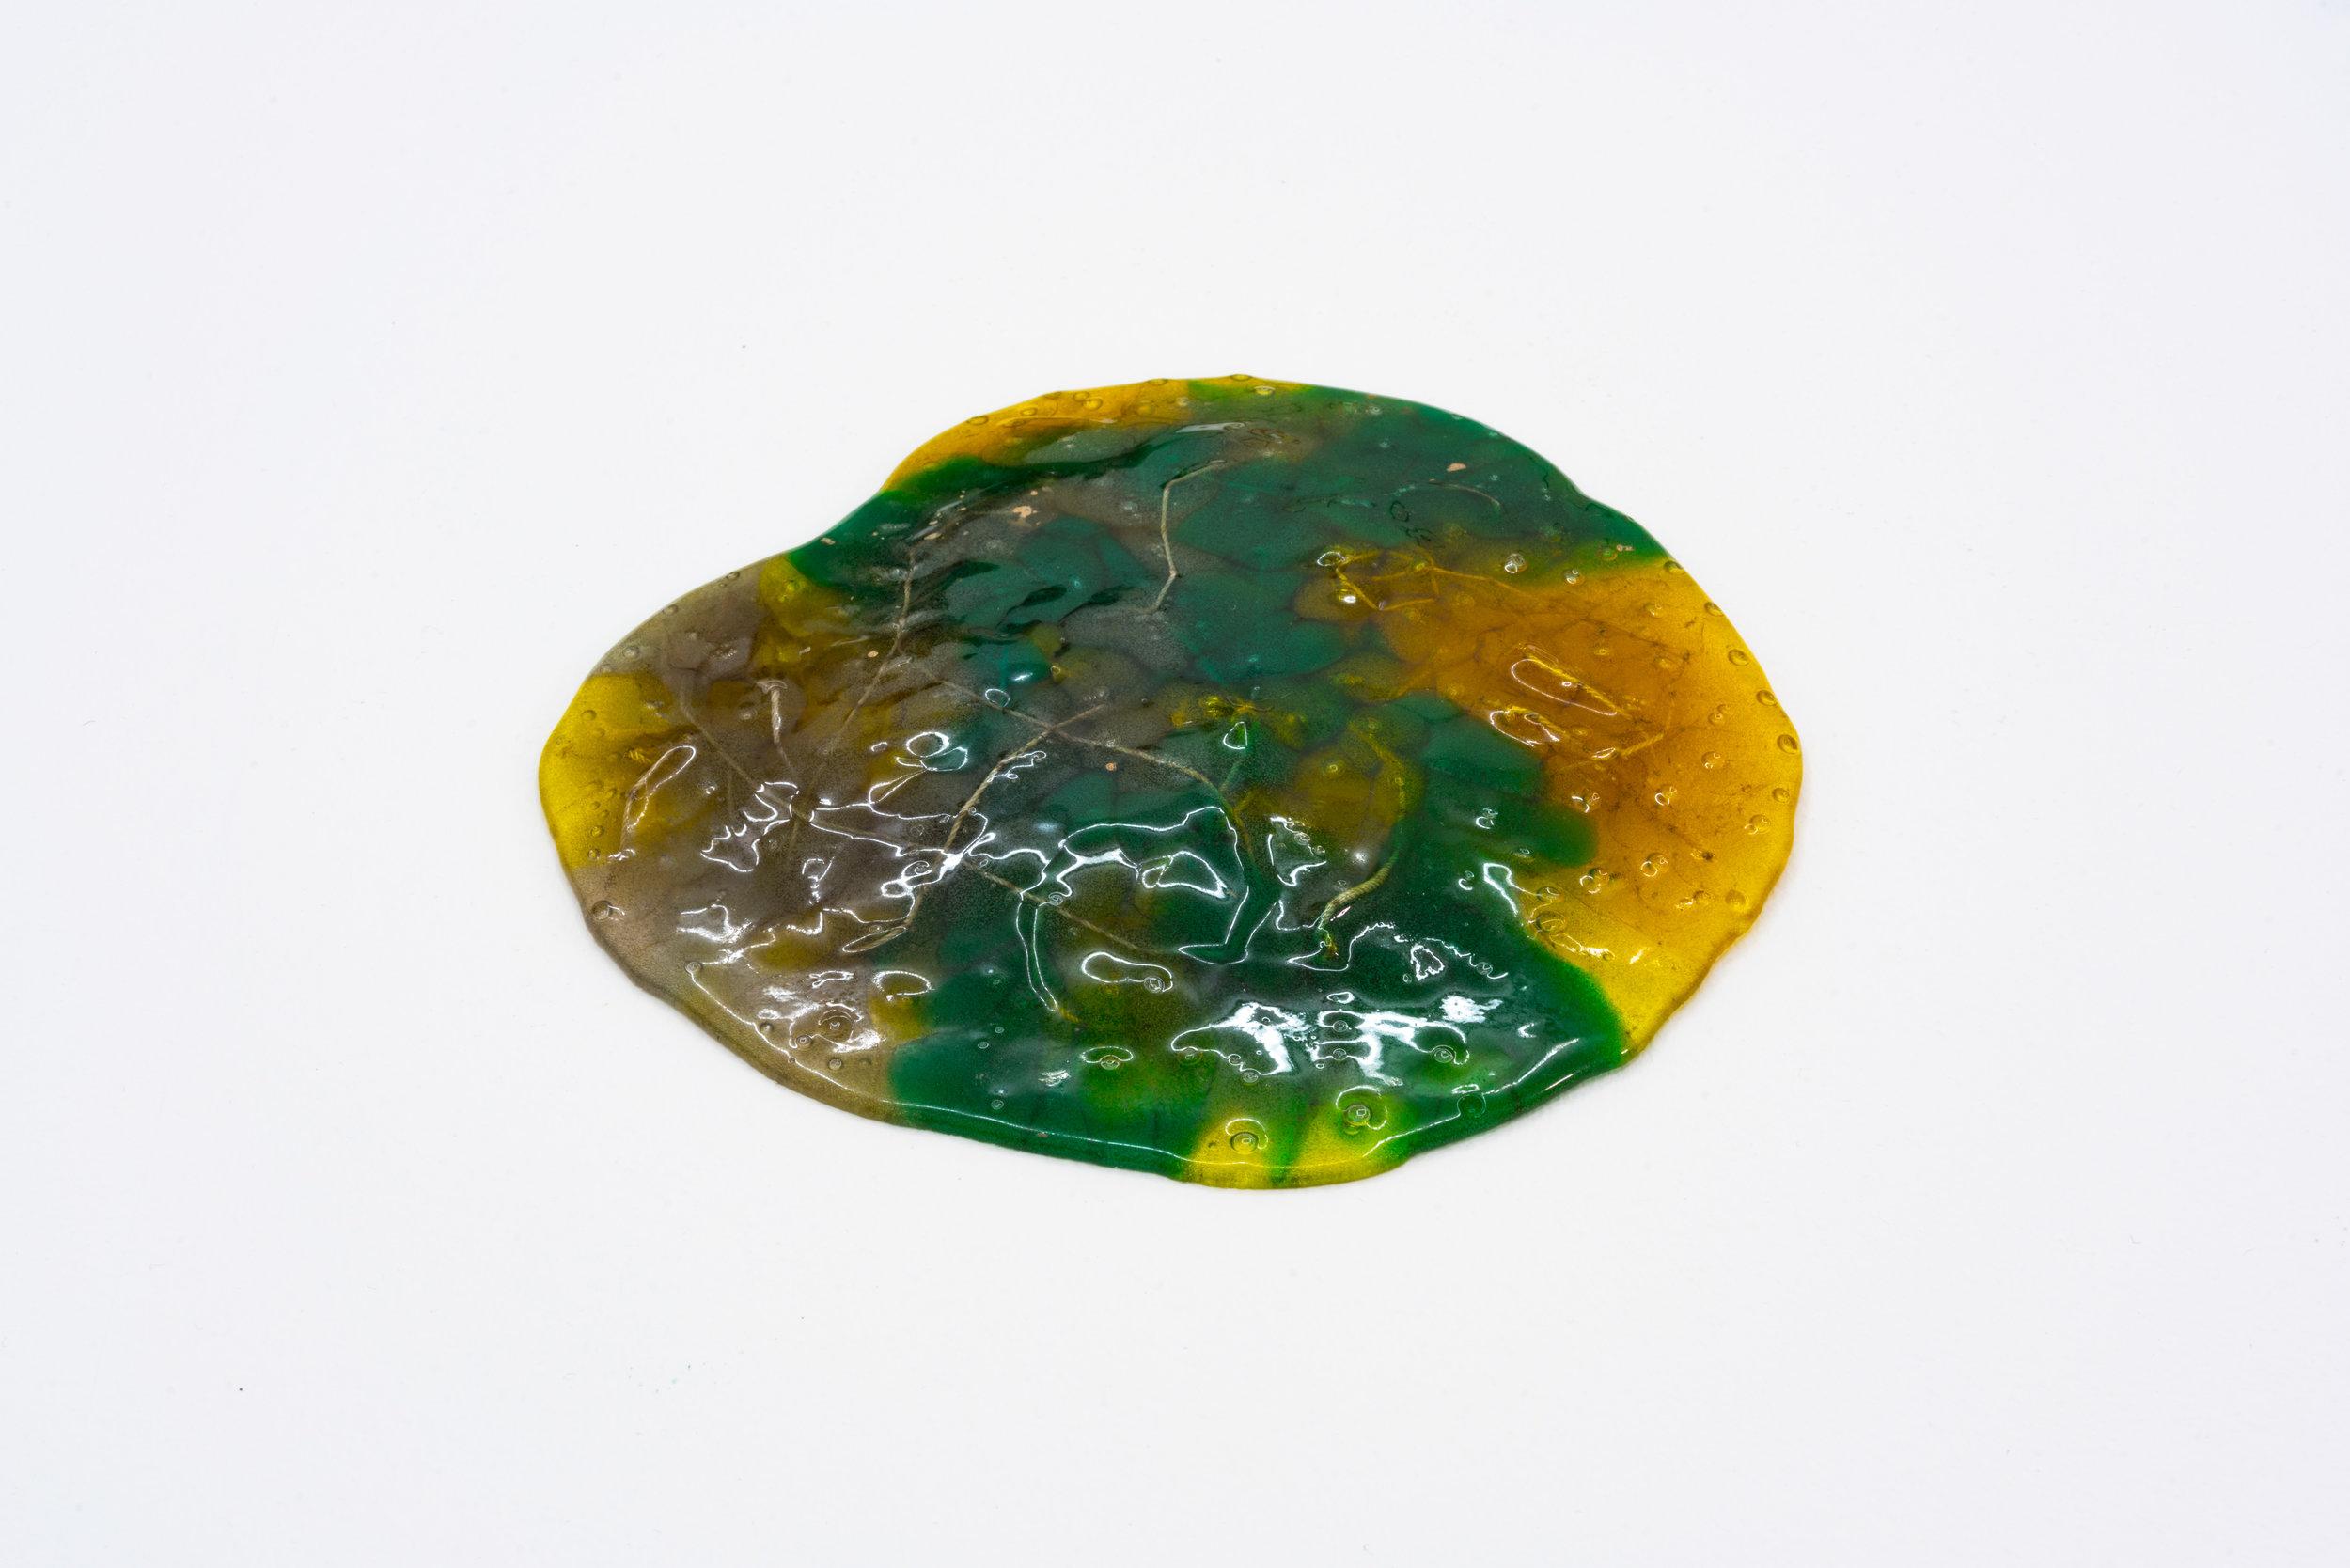 Remko Scha,  Plastic Meltdown , 1962-1992, Plastic, 1 x 17 x 17 cm